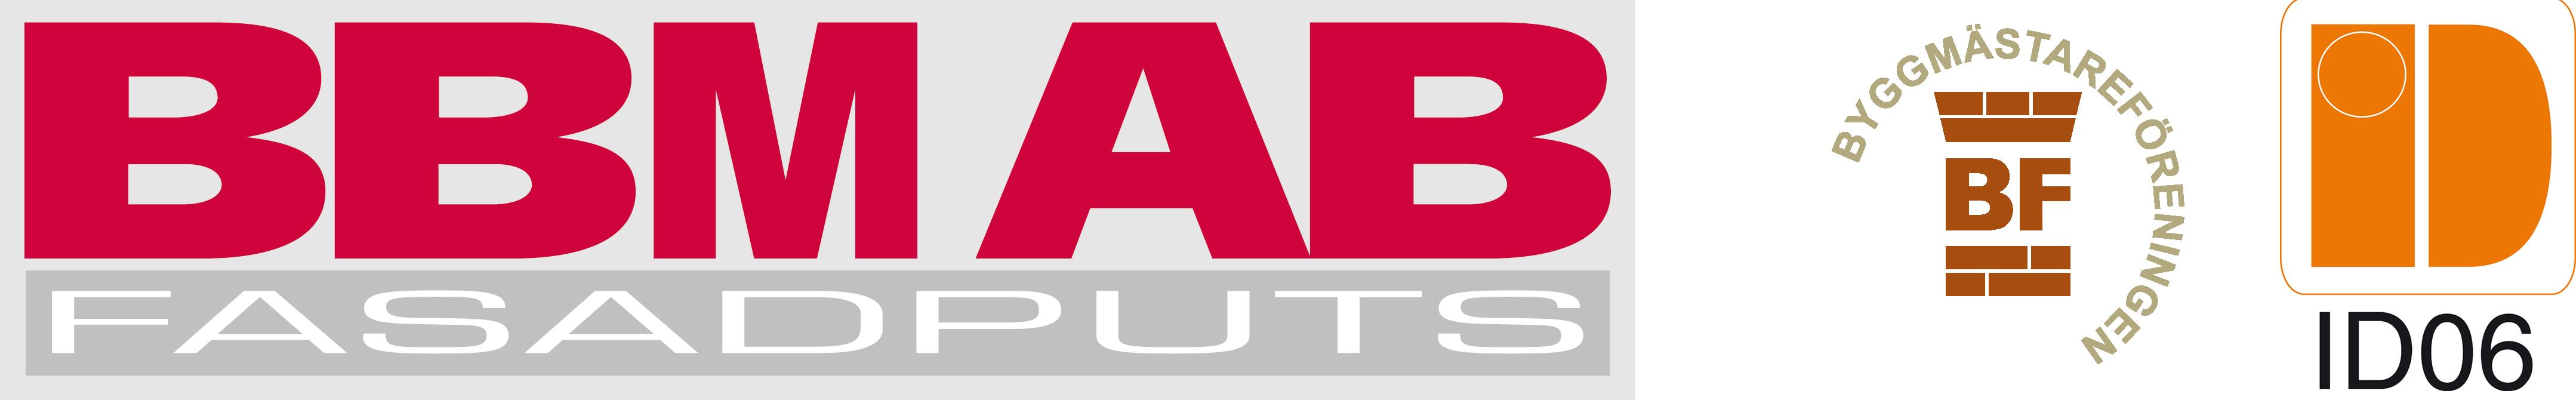 bbm logo 080421idbf